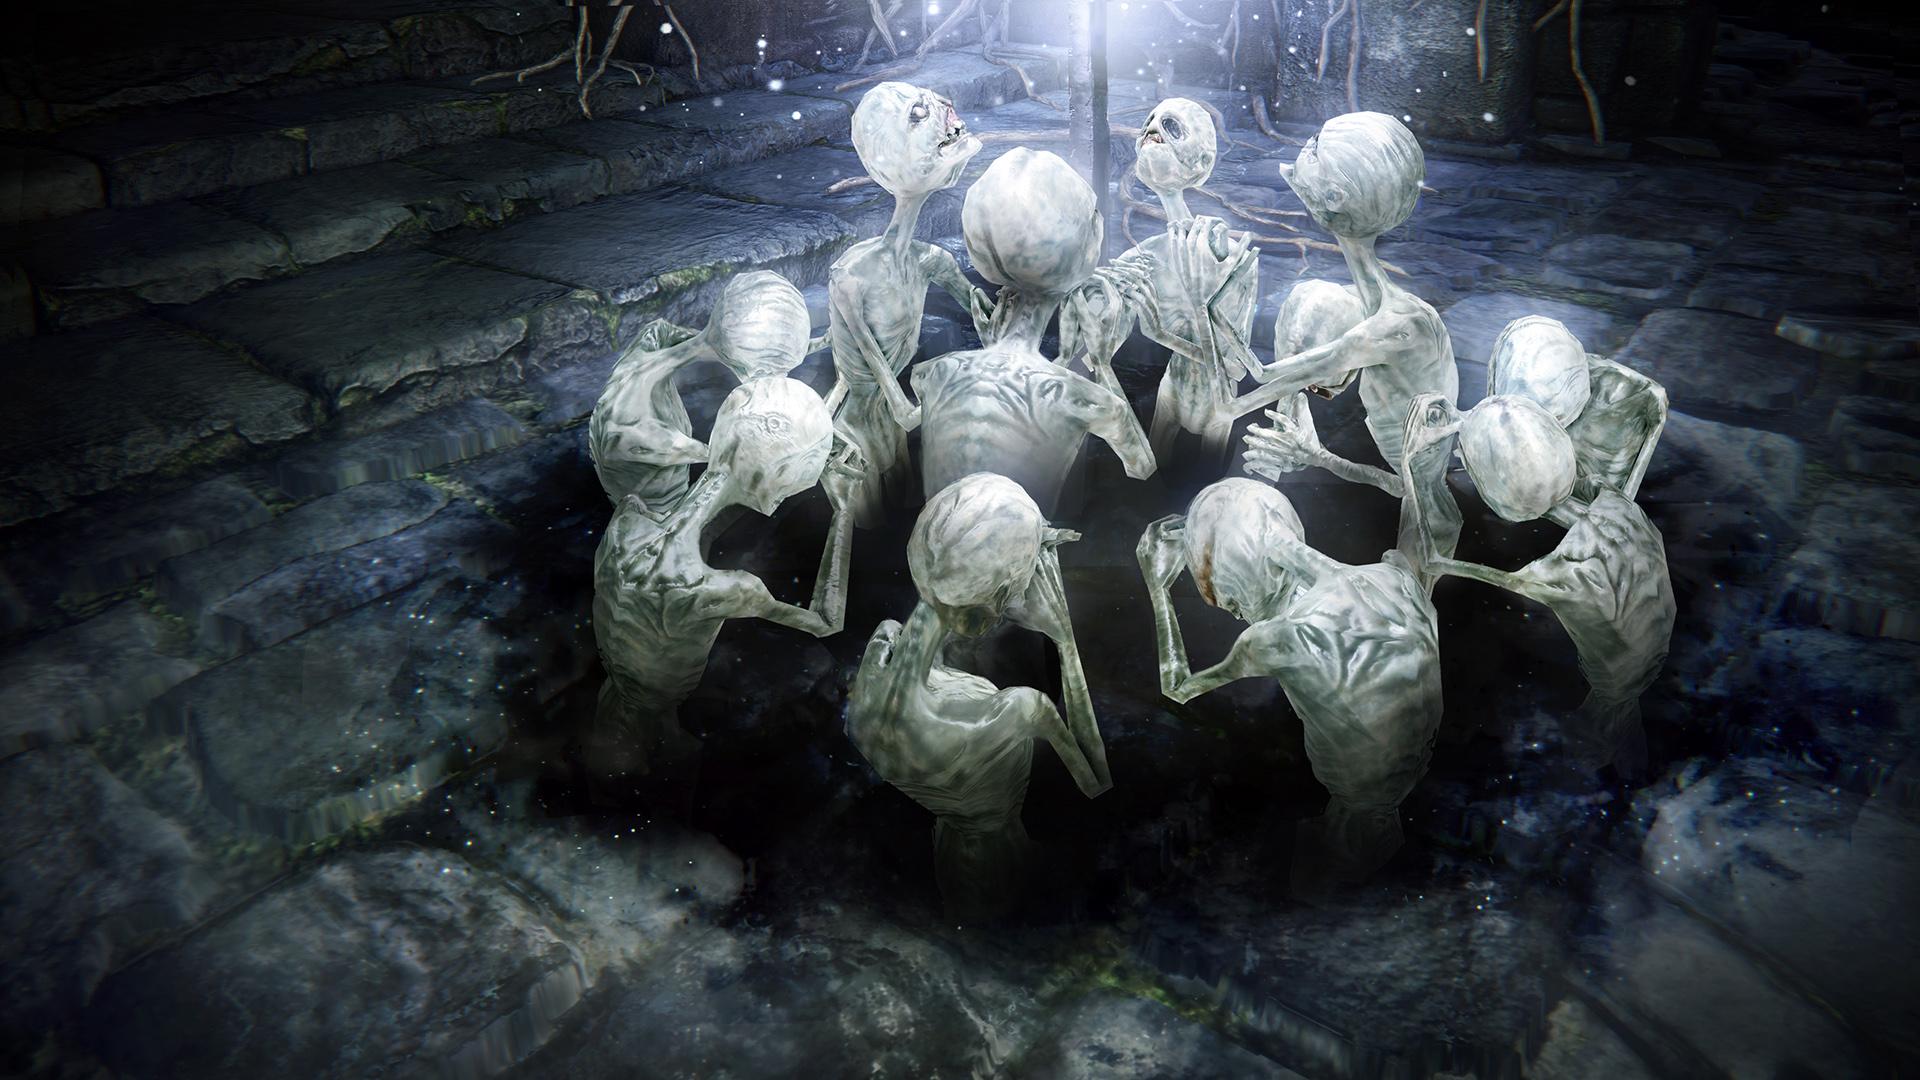 Dark souls 2 pvp com full havel maycon bahamut - 2 1